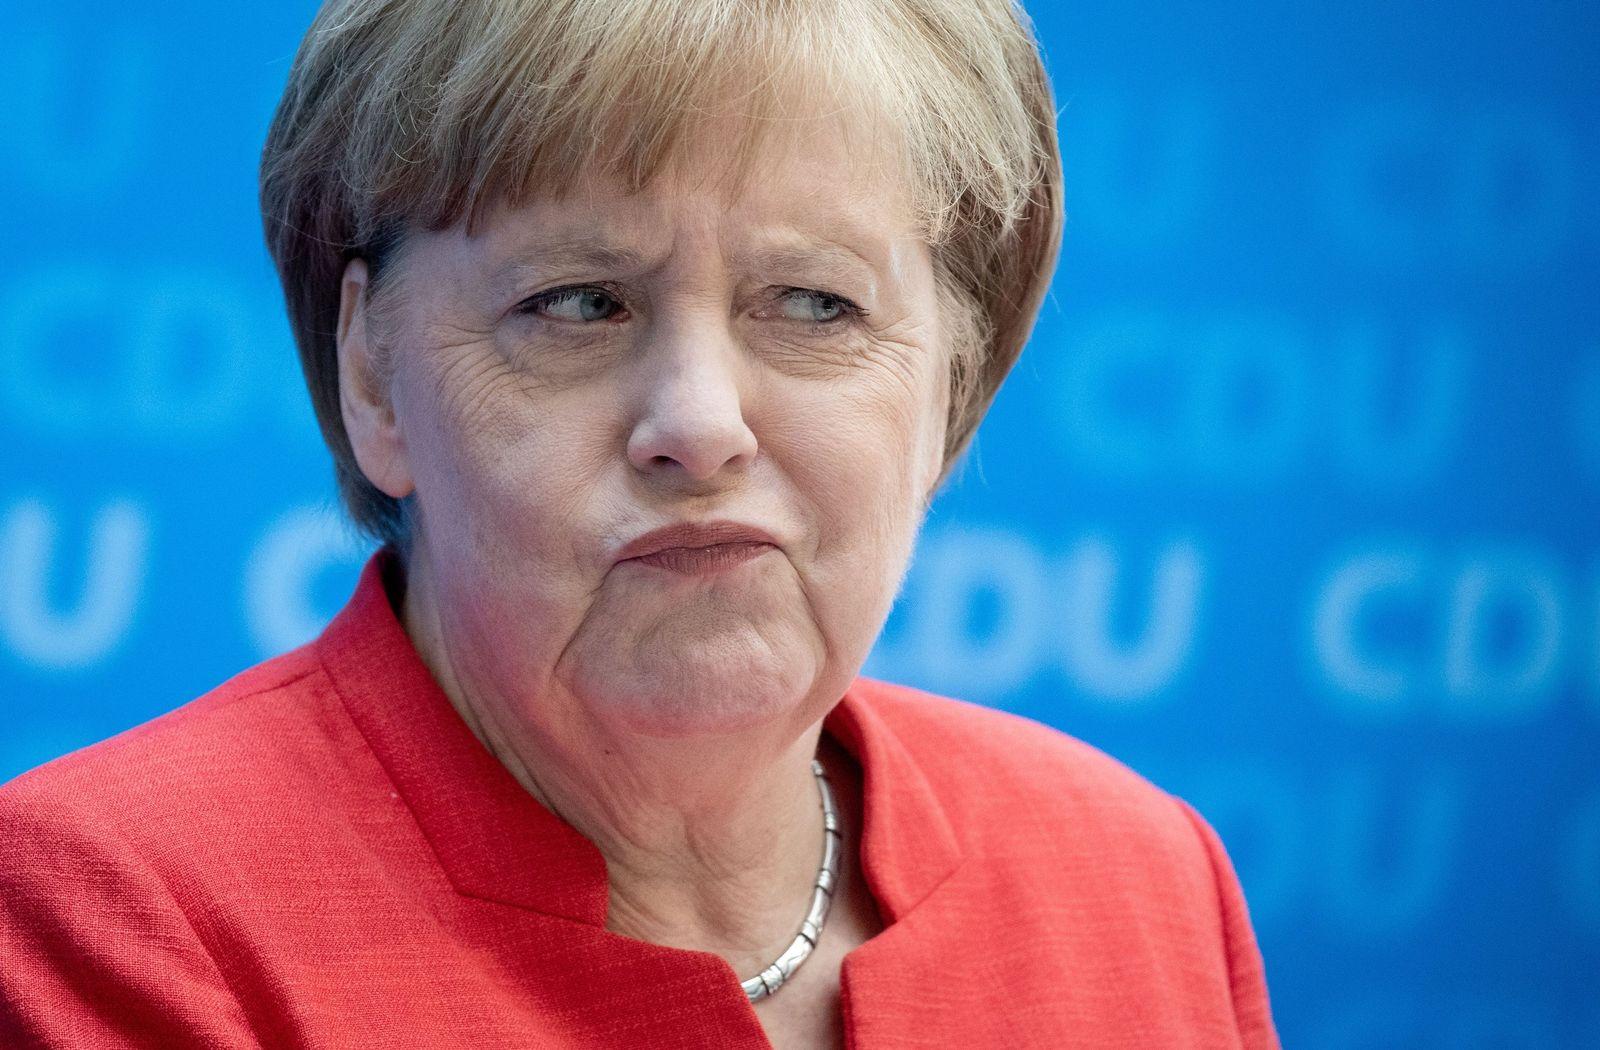 CDU-Bundesvorstand merkel